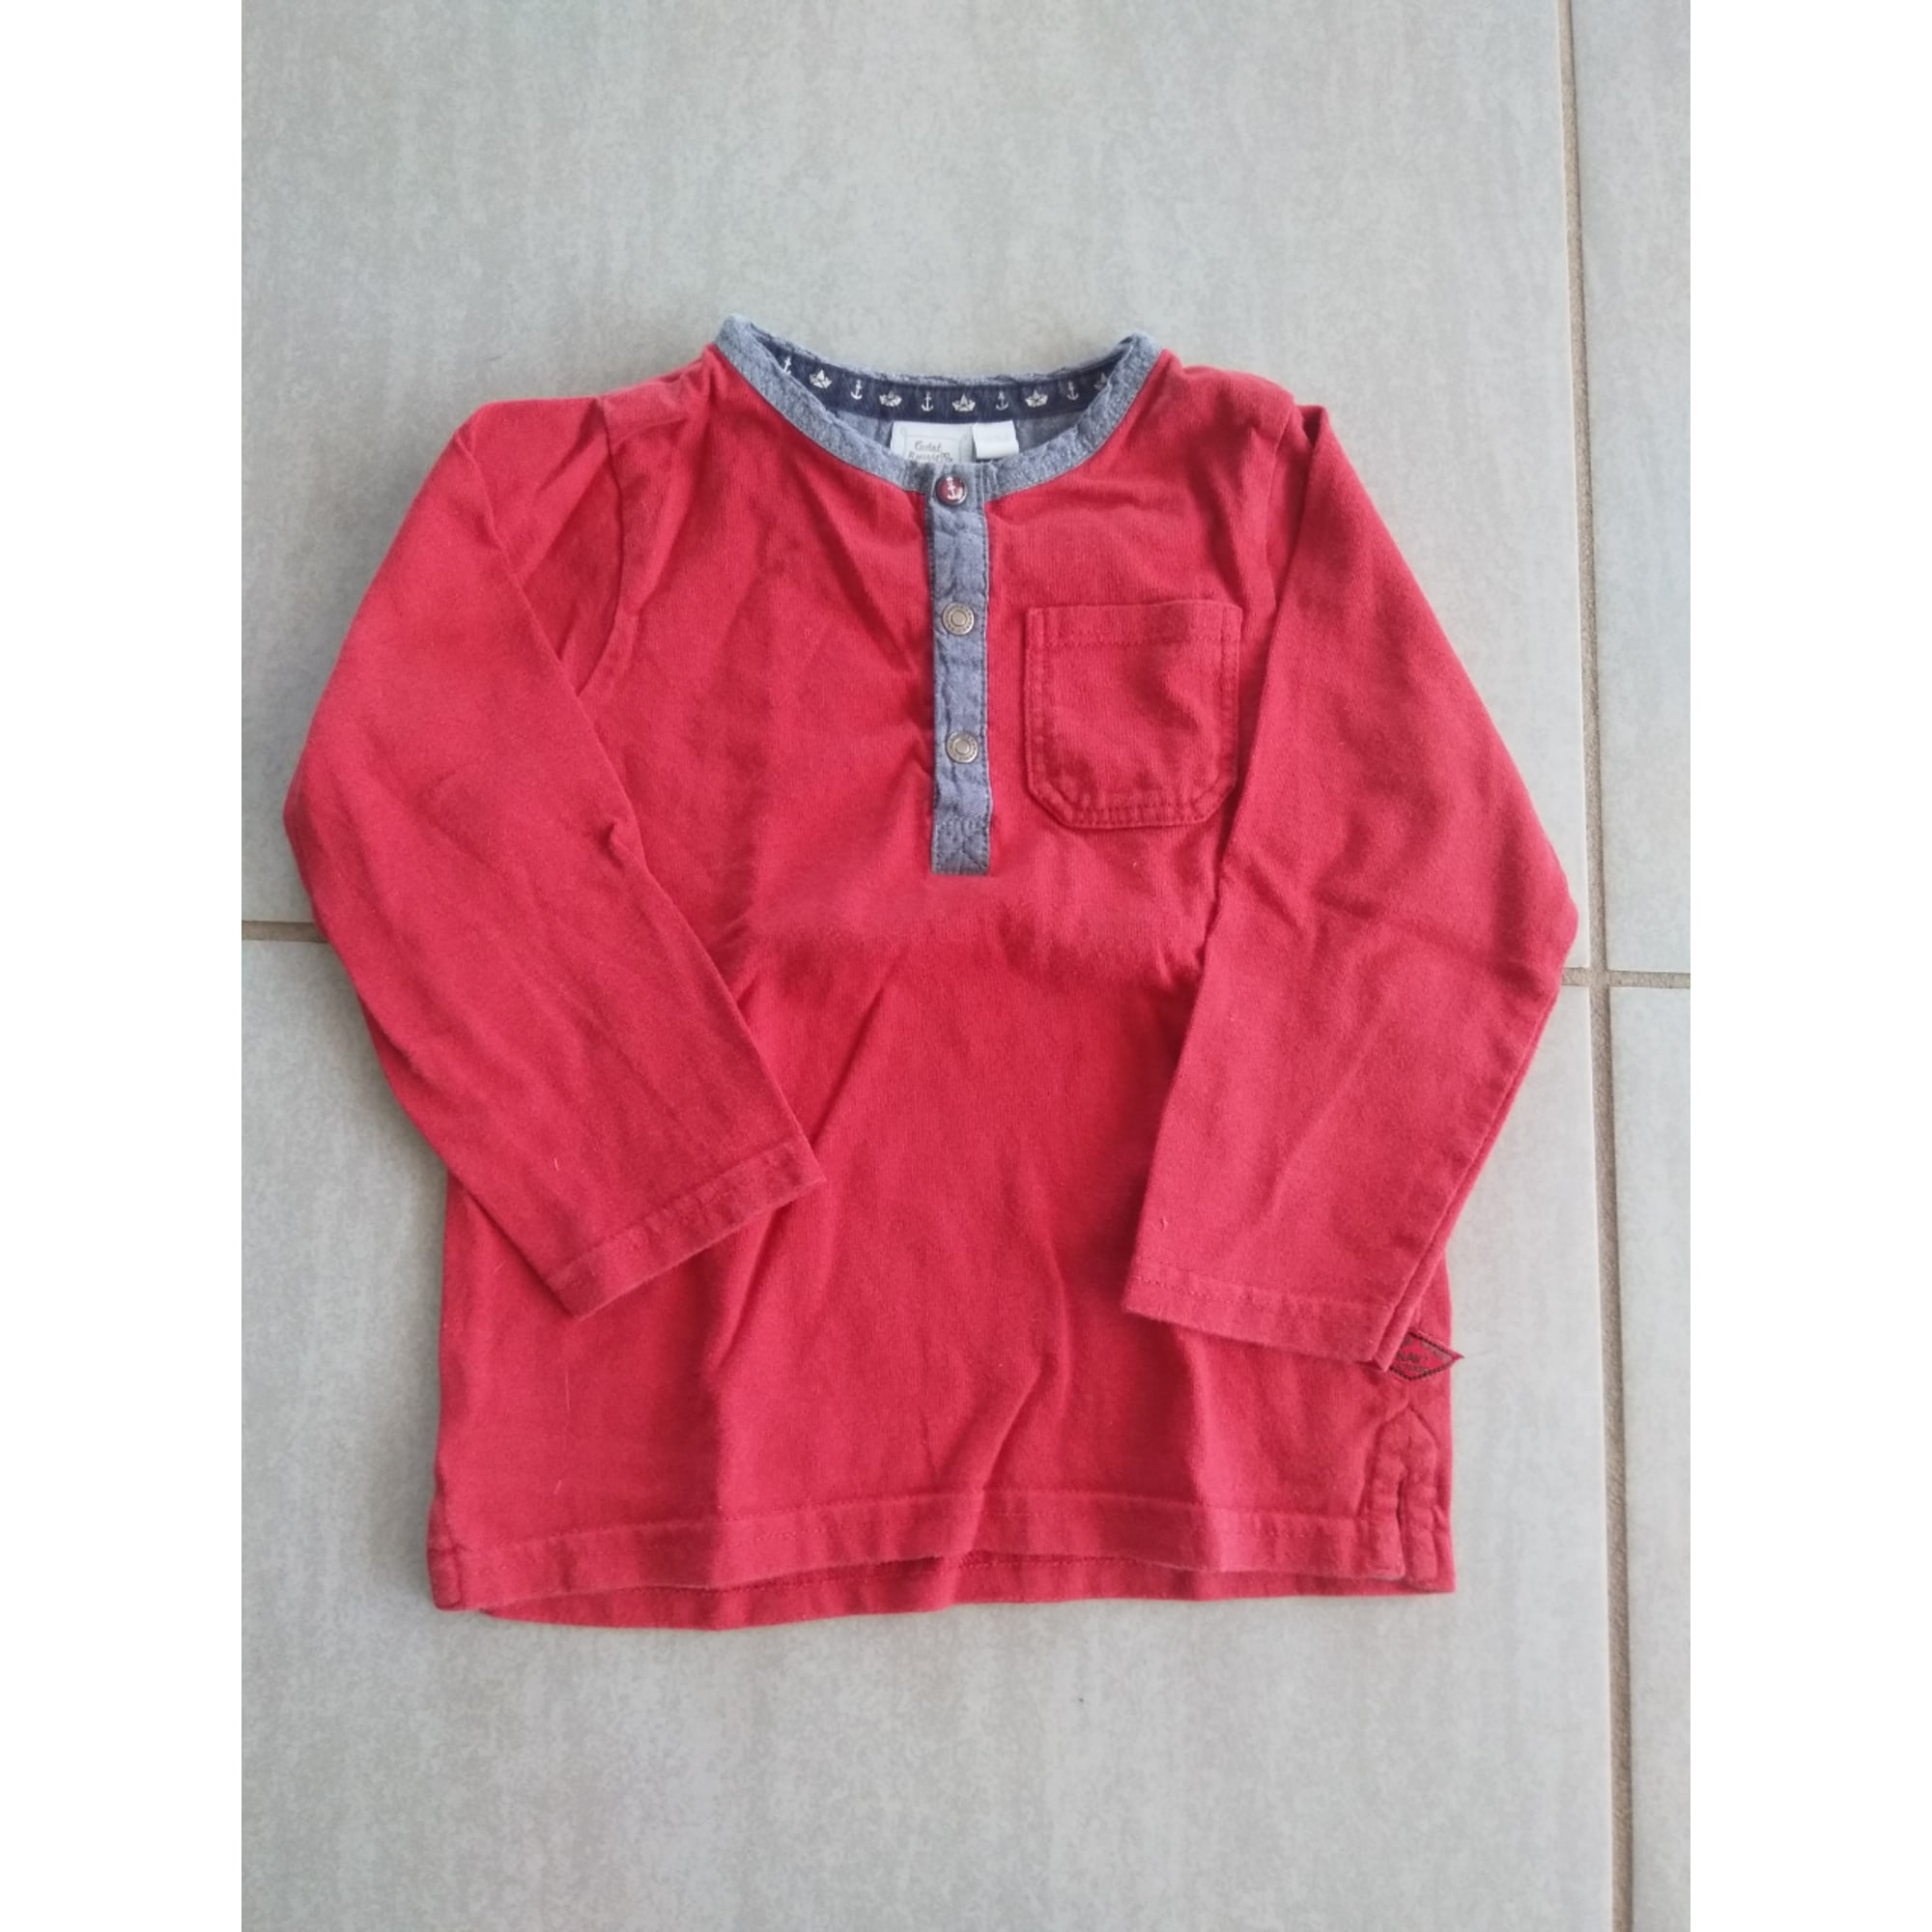 Top, T-shirt CADET ROUSSELLE Red, burgundy